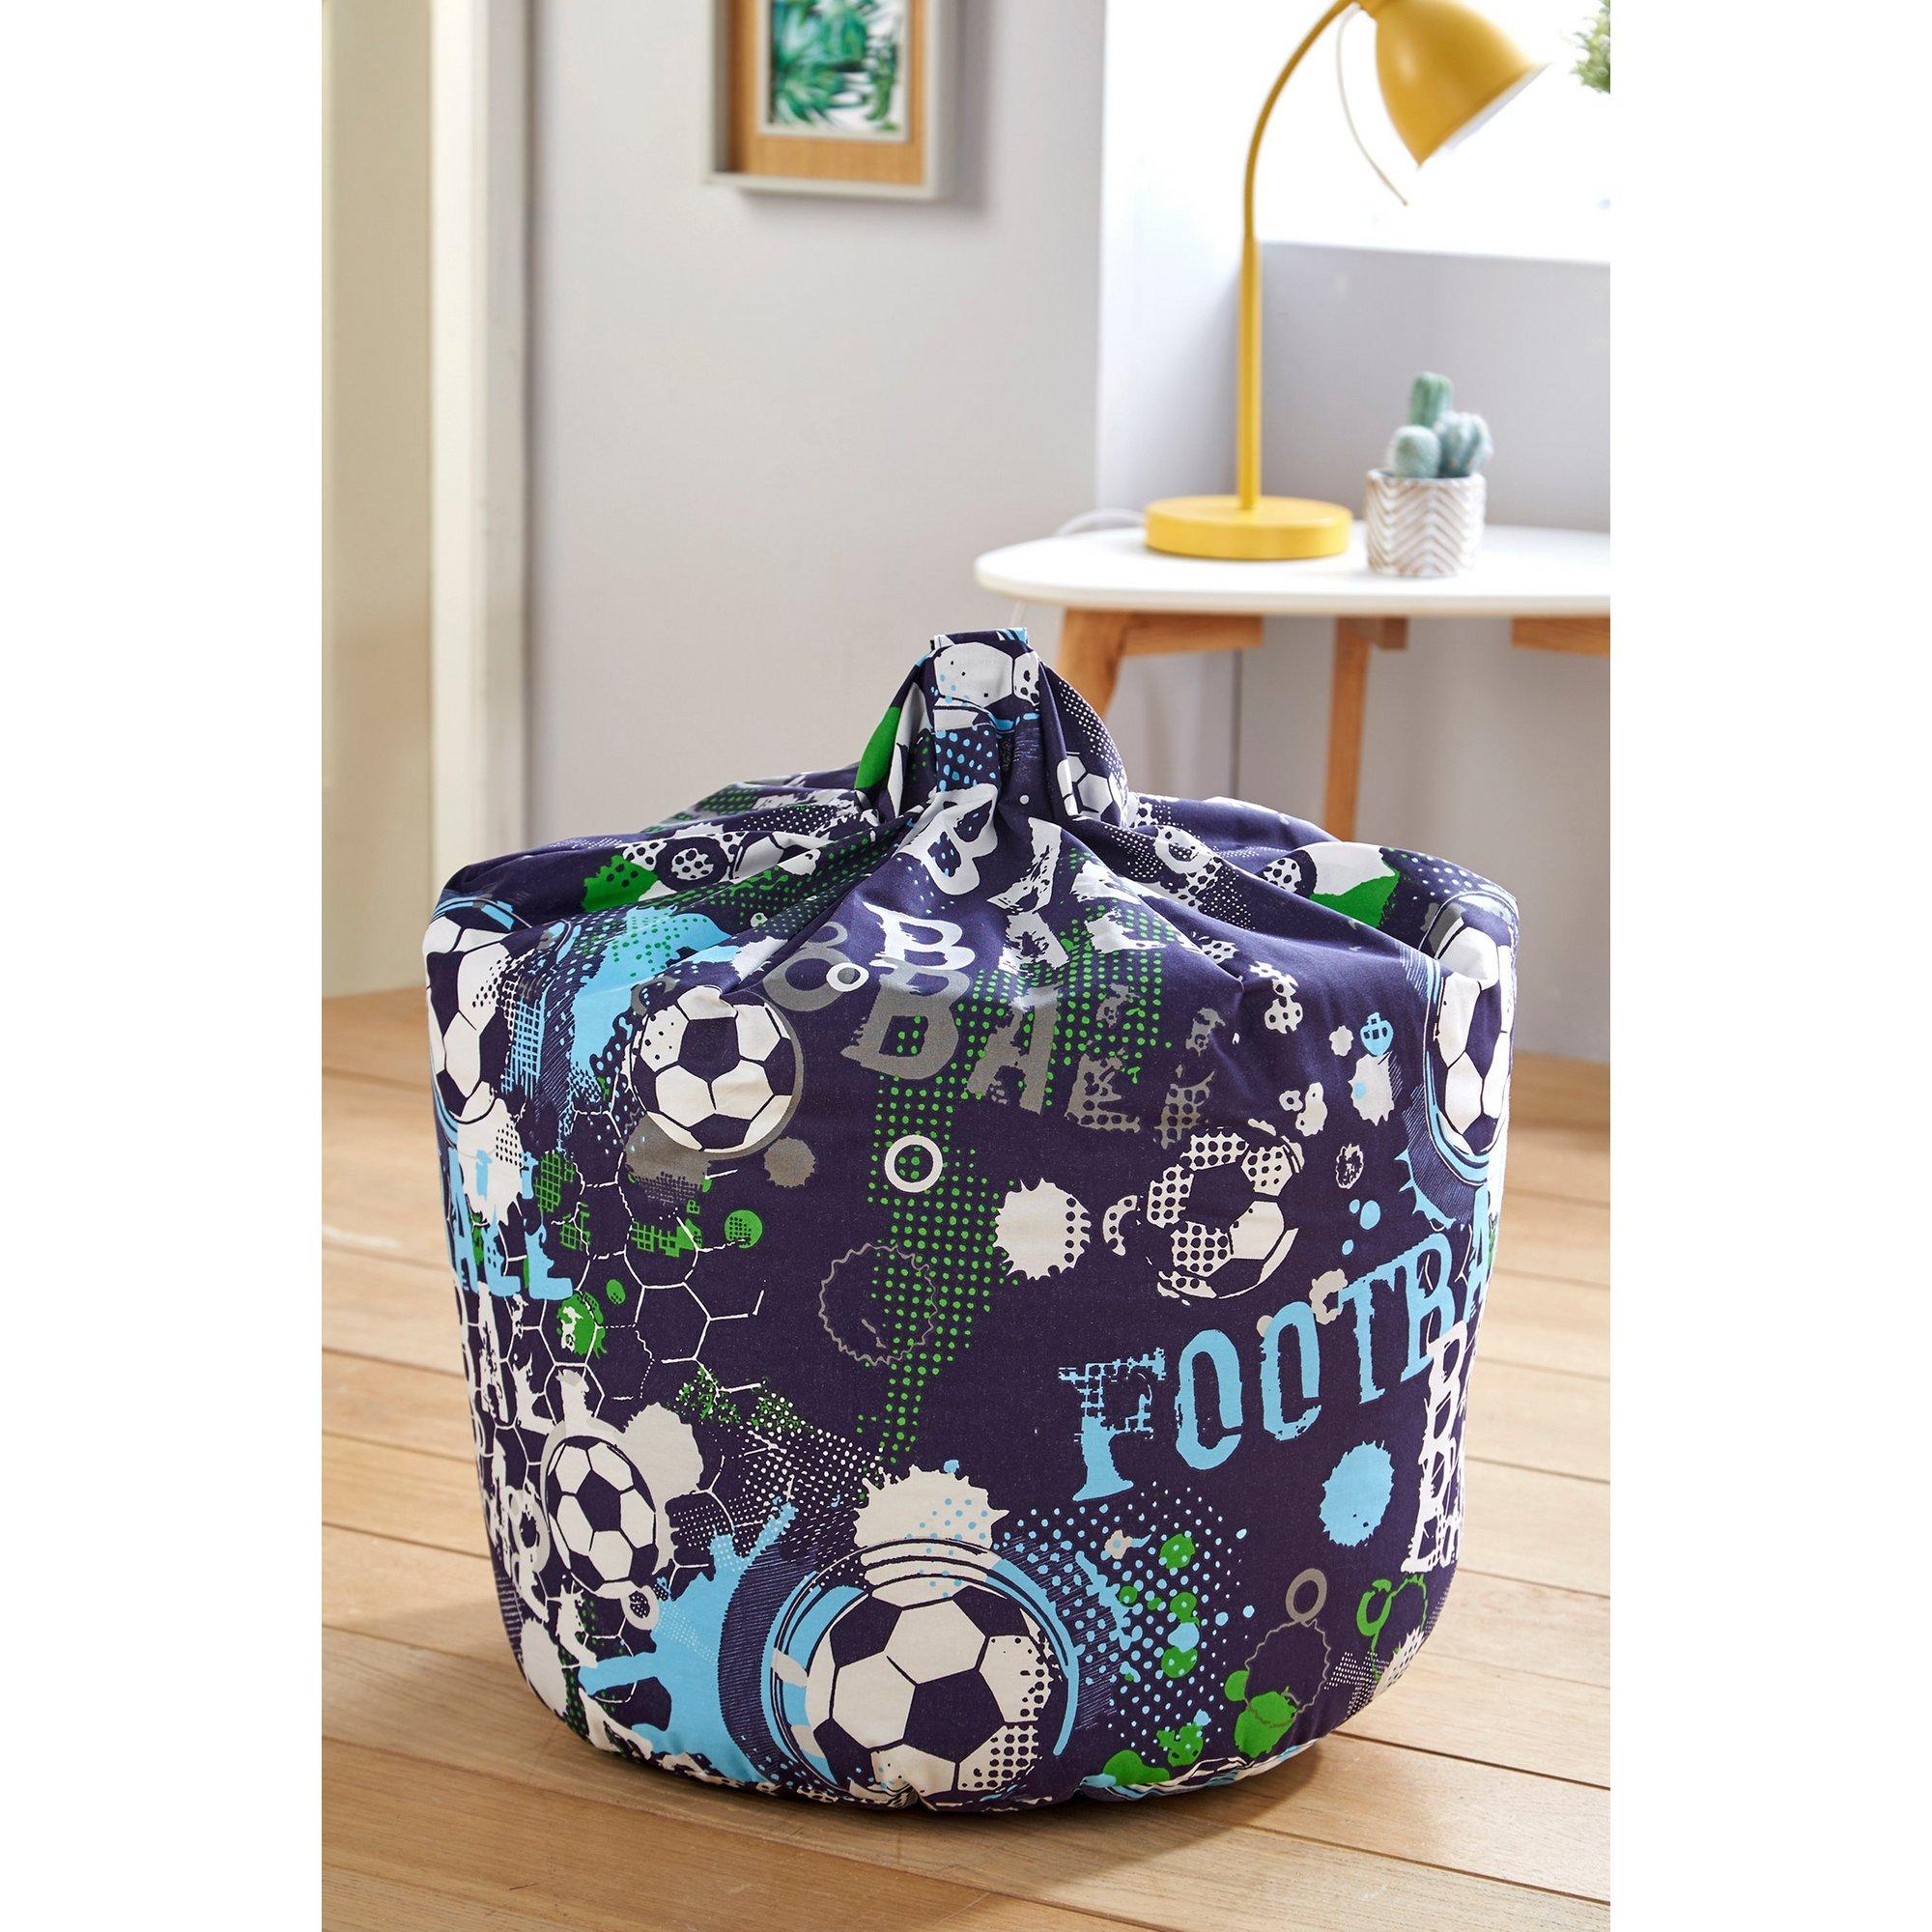 Image of Kids Football Bean Bag